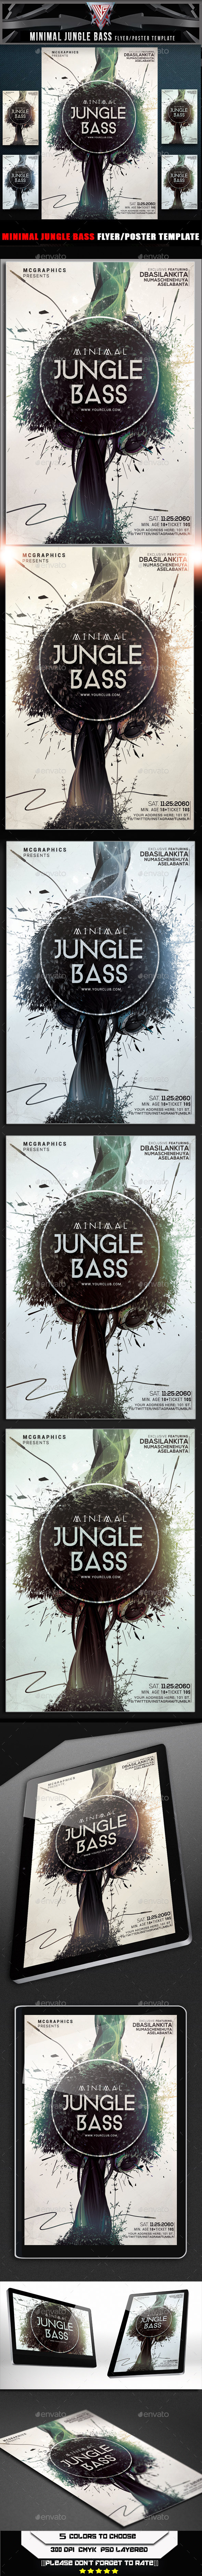 Minimal Jungle Bass Flyer Template - Flyers Print Templates